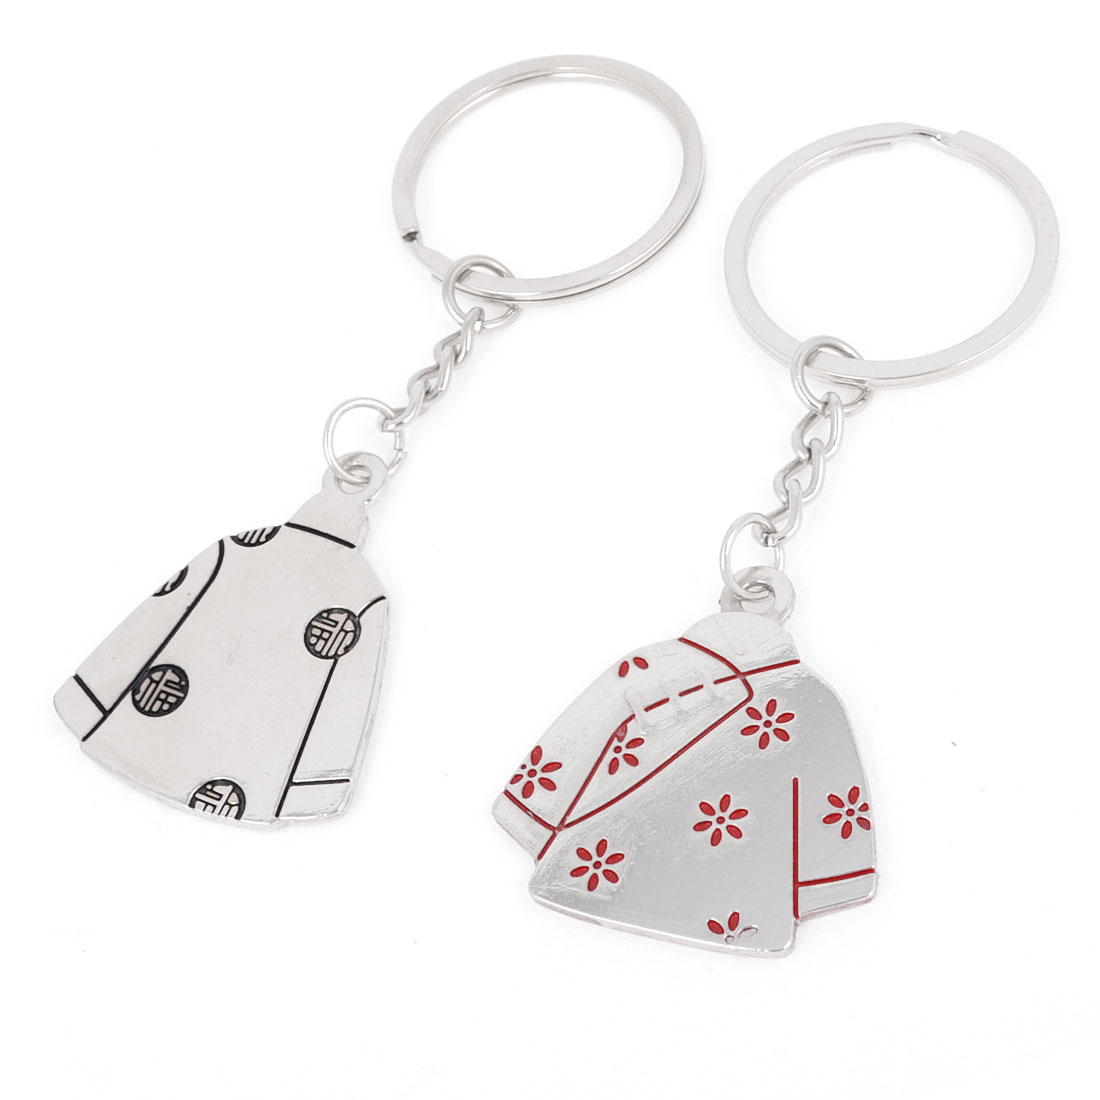 2pcs Silver Tone Clothes Design Decor Dangle Pendant Keychain for Couple